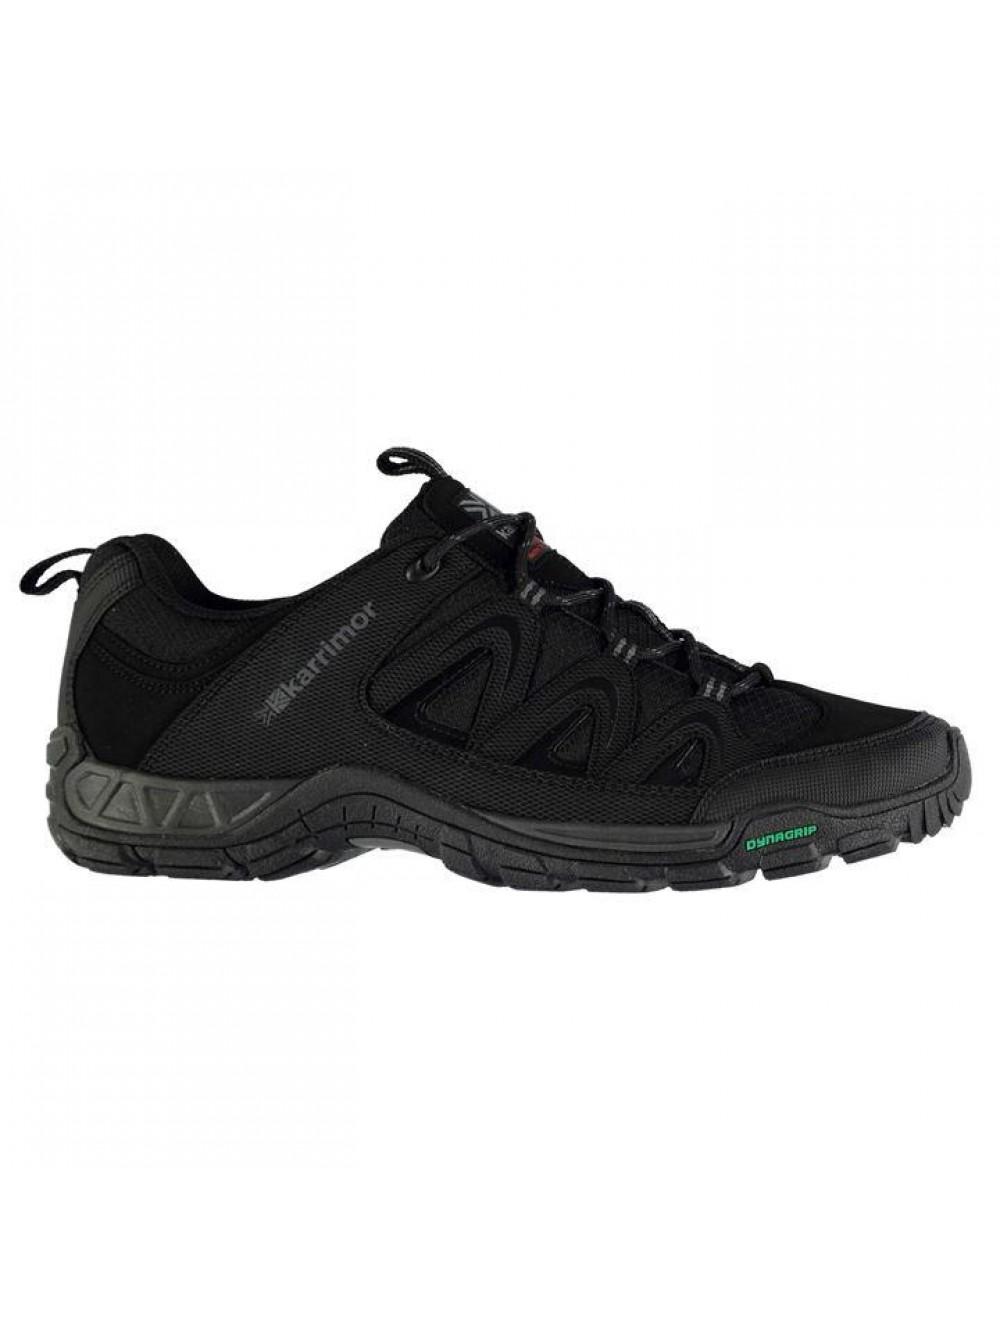 Karrimor Summit - Взуття трекінгове 810fa75fcb7a5